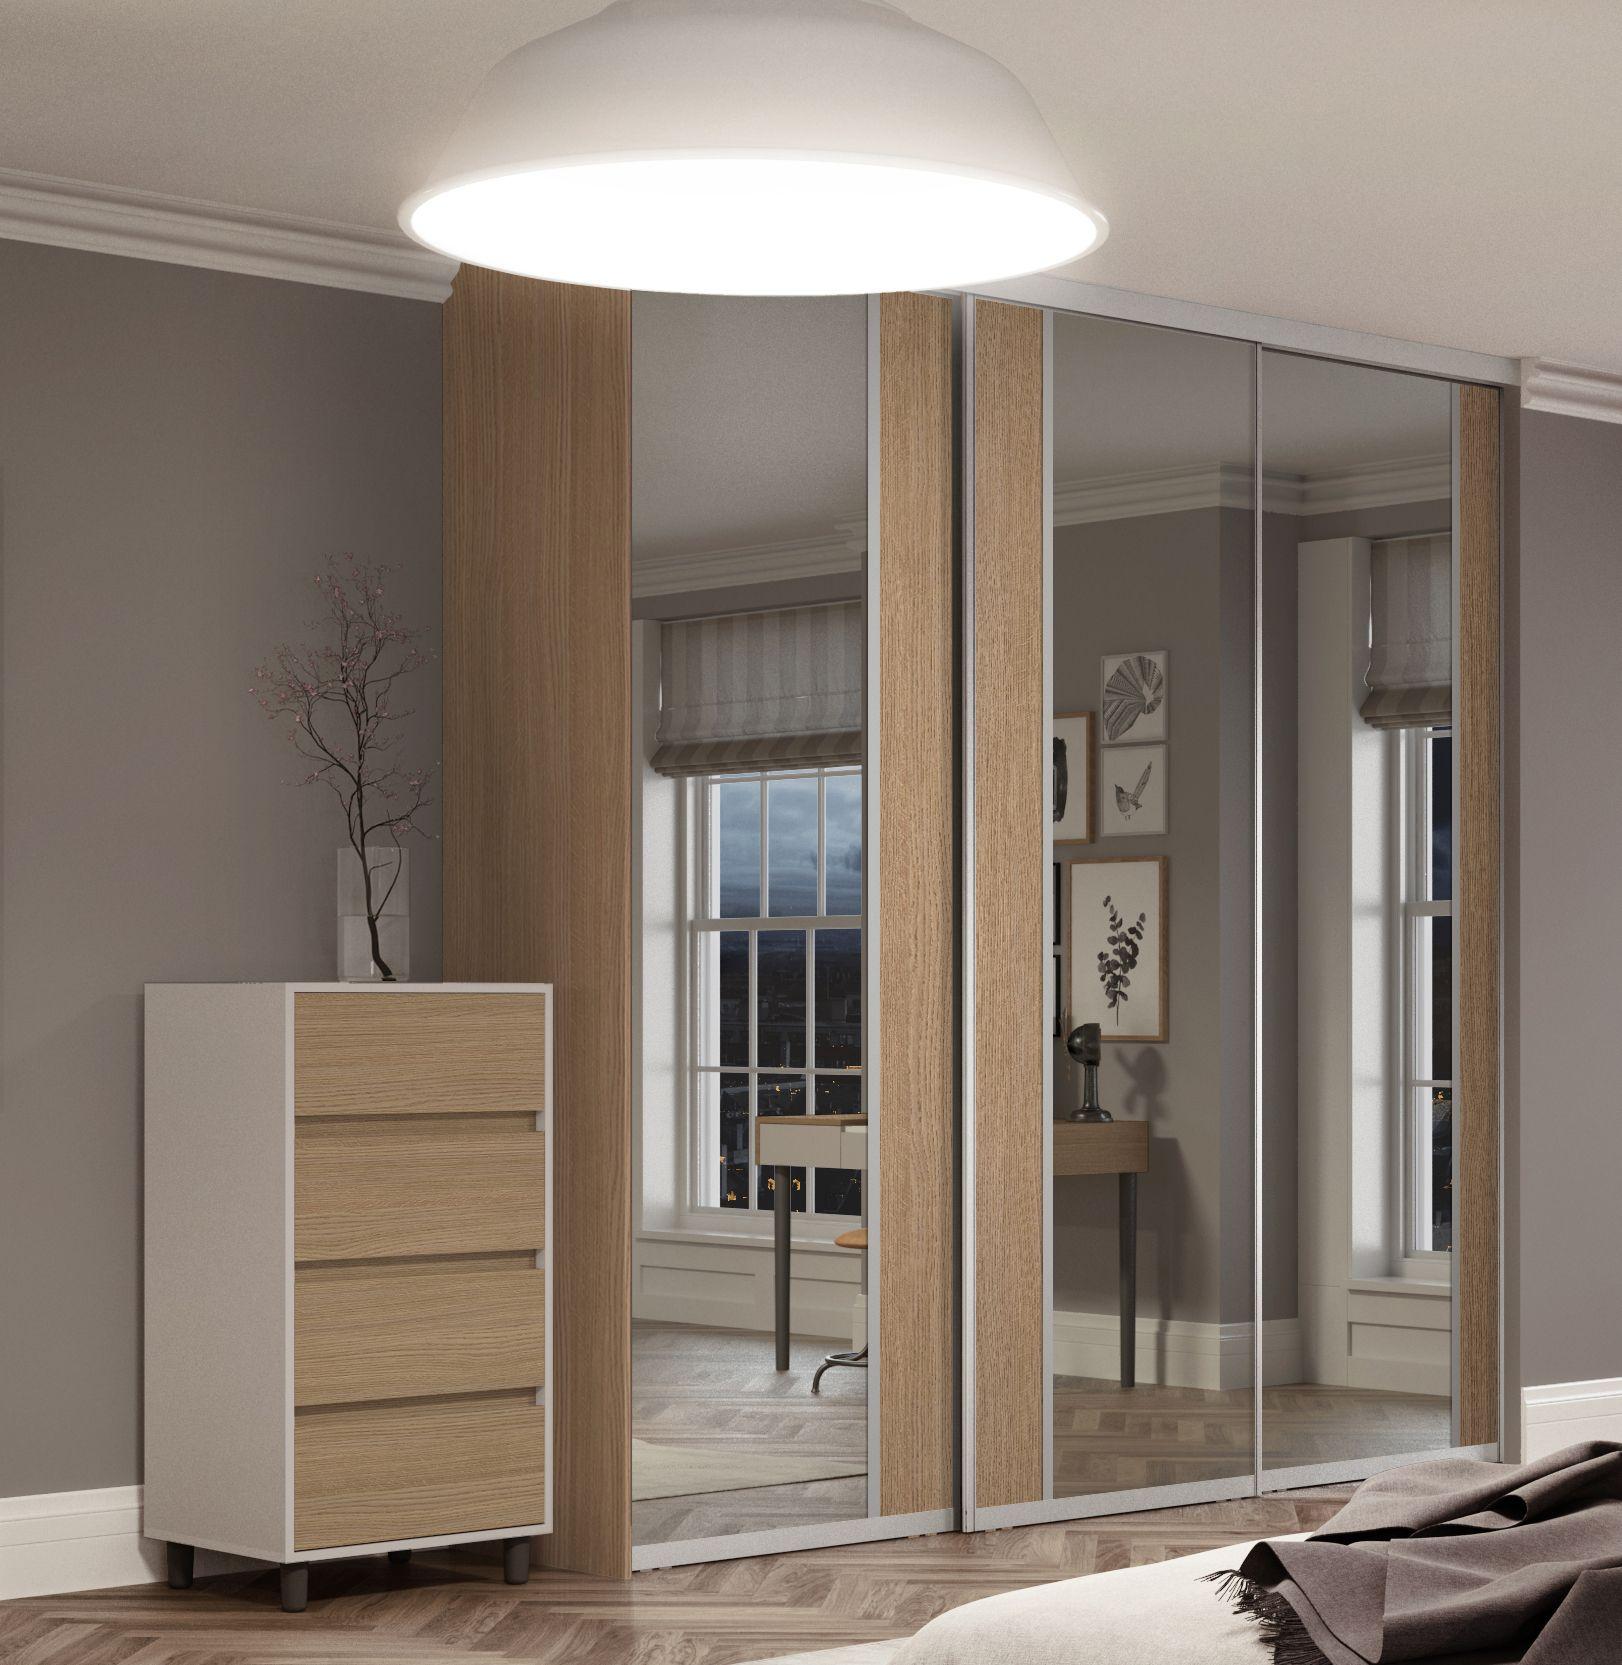 Premium Midi vertical split panel sliding wardrobe doors in Mirror